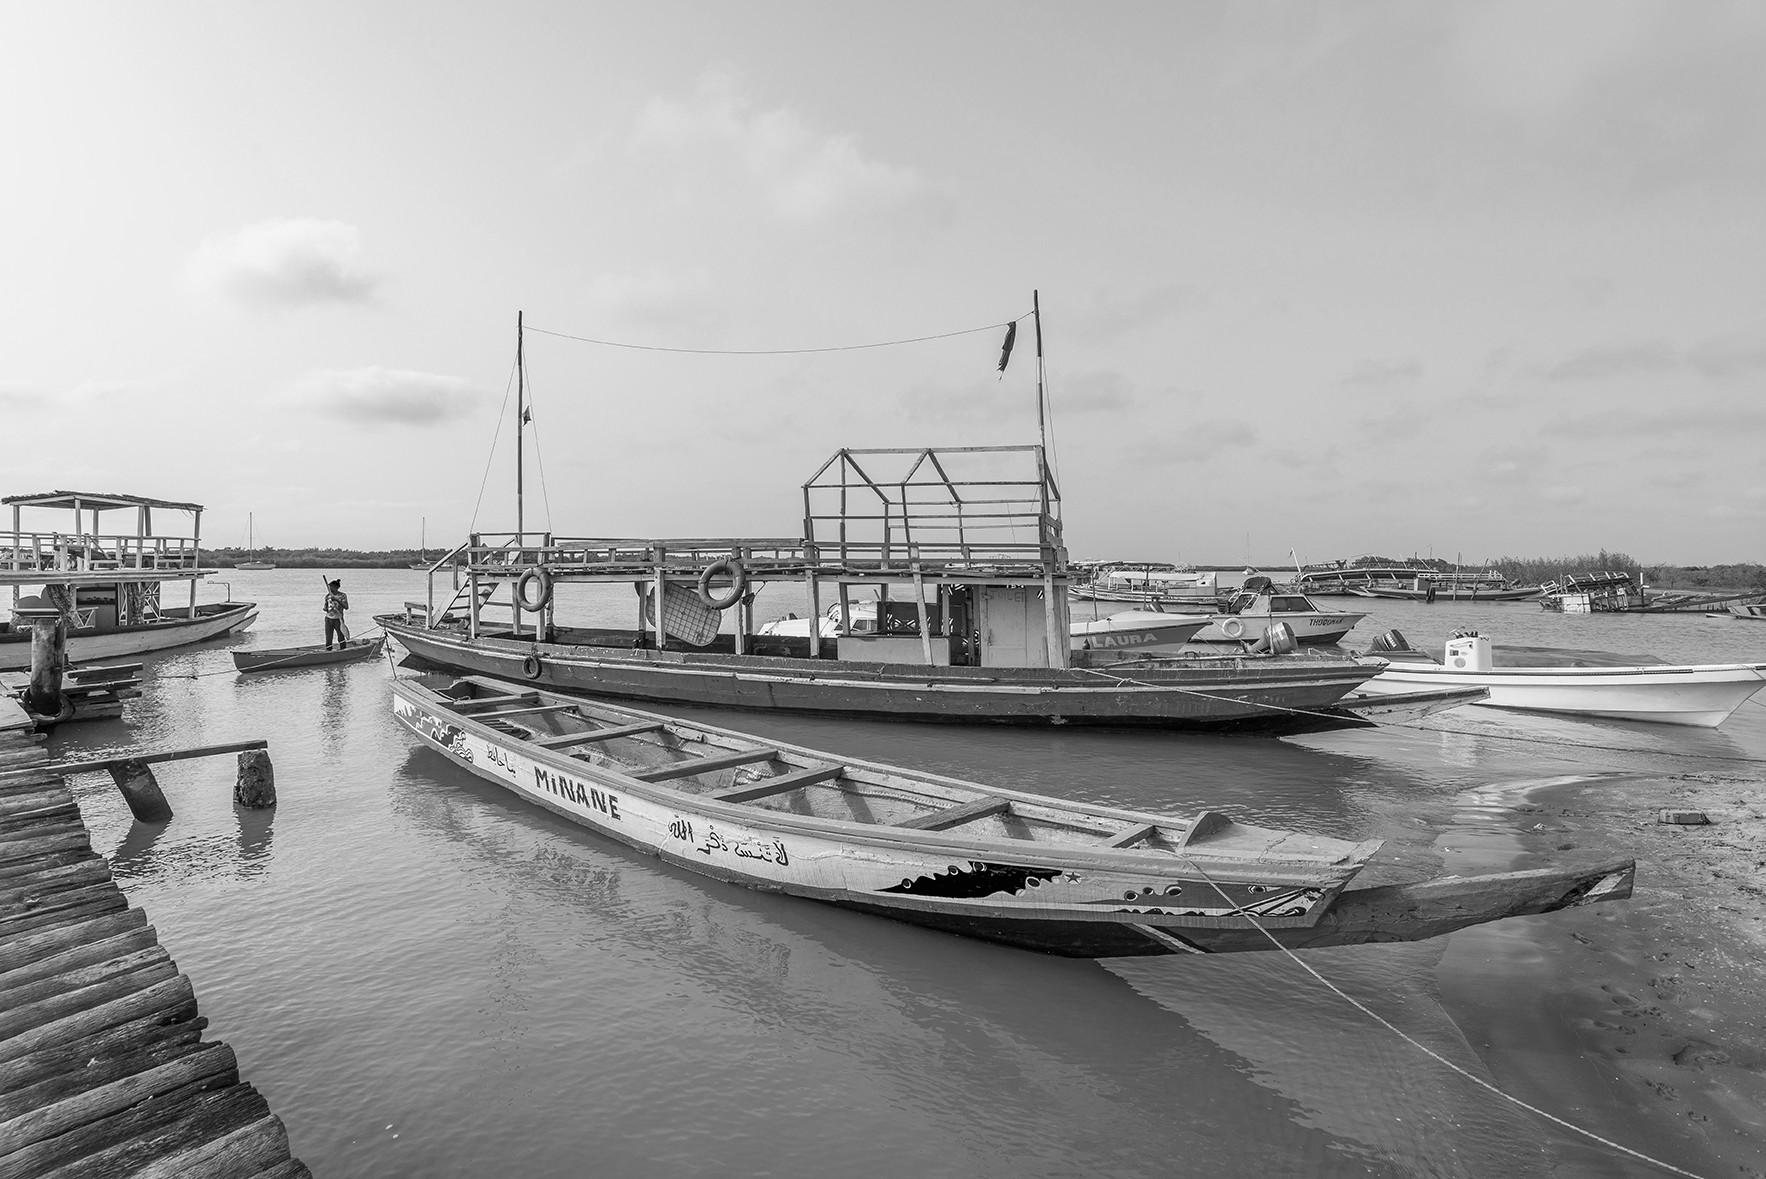 000182-Gambia-Banjul